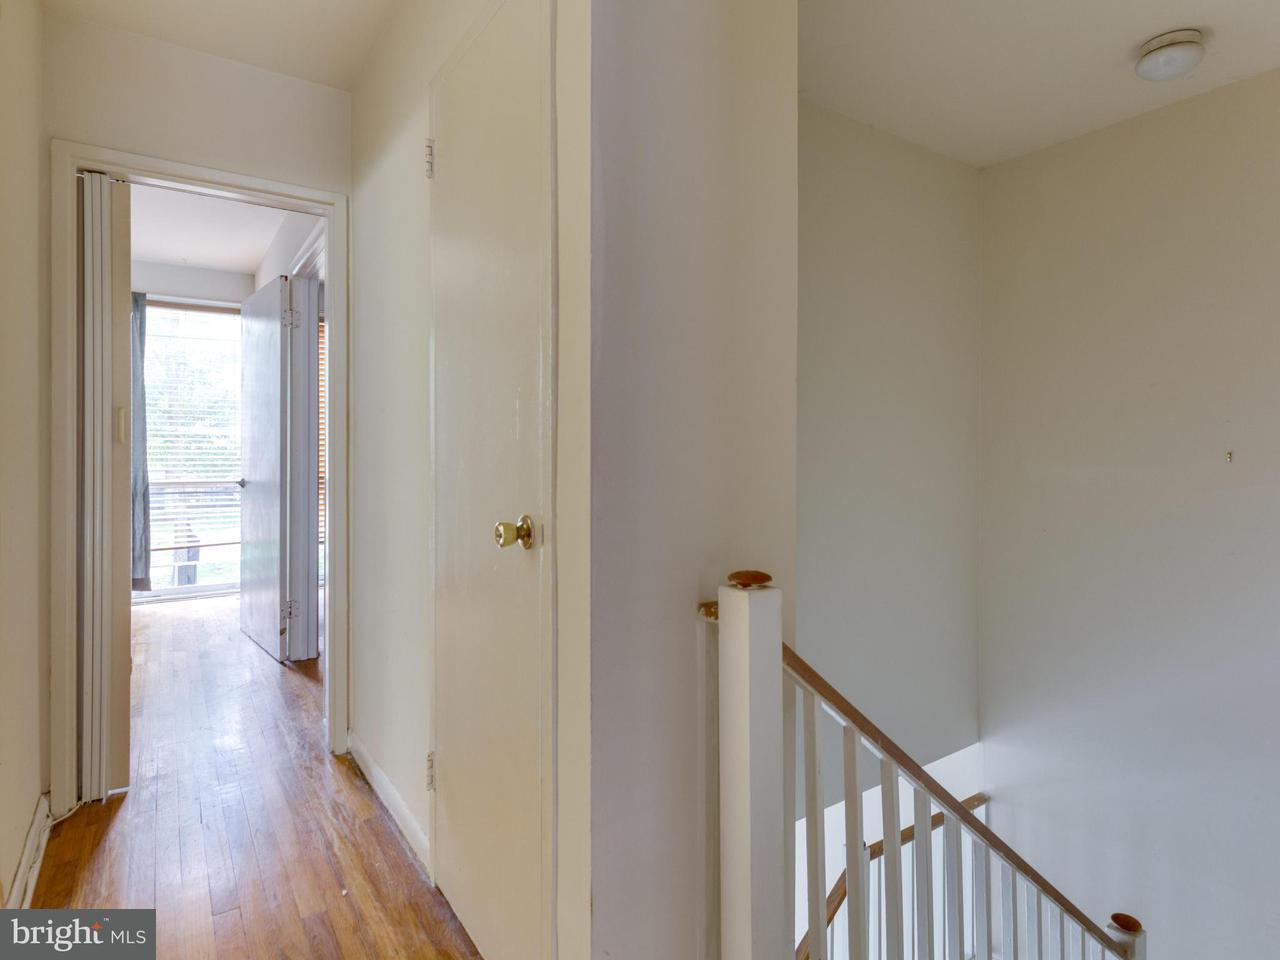 Additional photo for property listing at 160 G St Sw #146 160 G St Sw #146 Washington, Distretto Di Columbia 20024 Stati Uniti